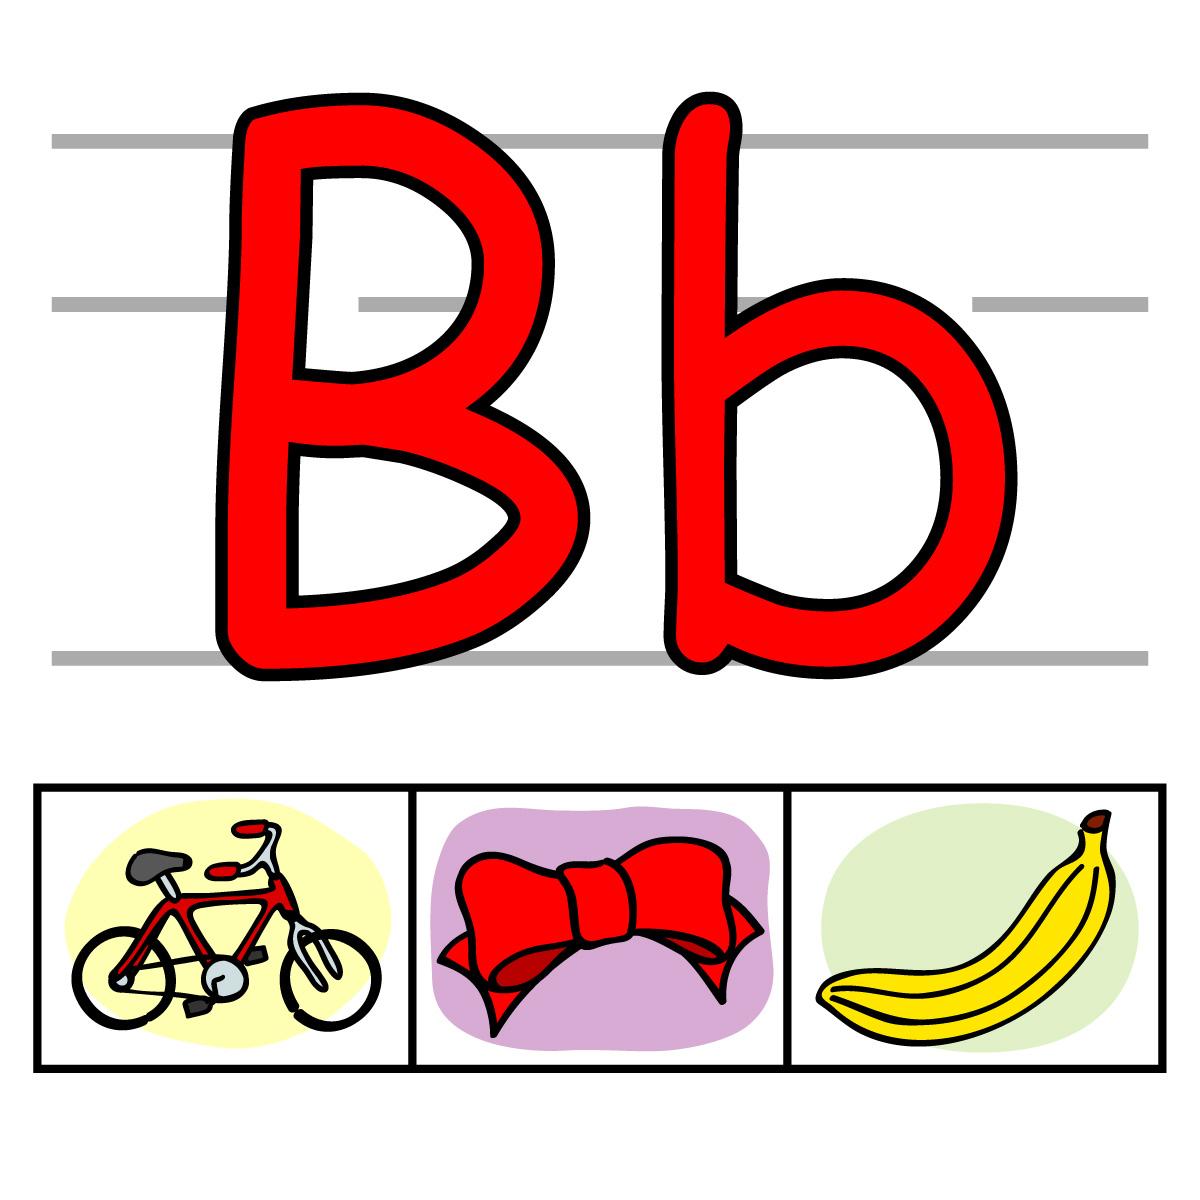 Abc individual alphabet letters clipart kid 2.